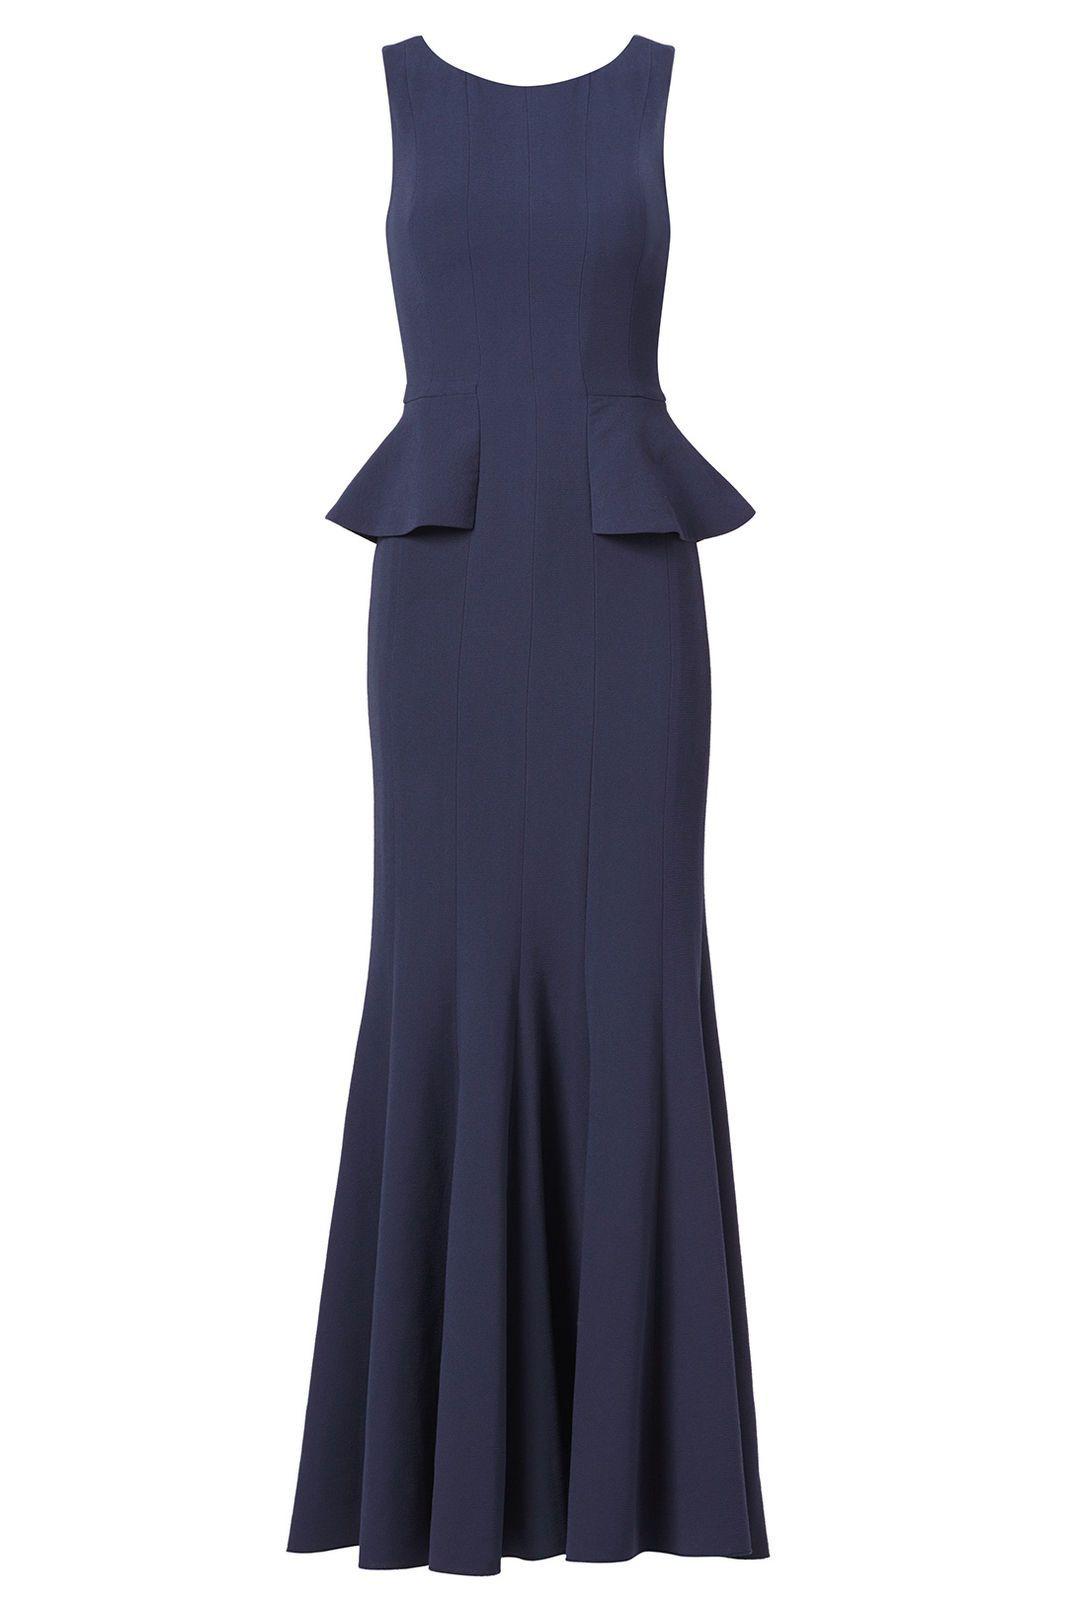 Cool great bcbgmaxazria navy blue womenus size peplum seamed